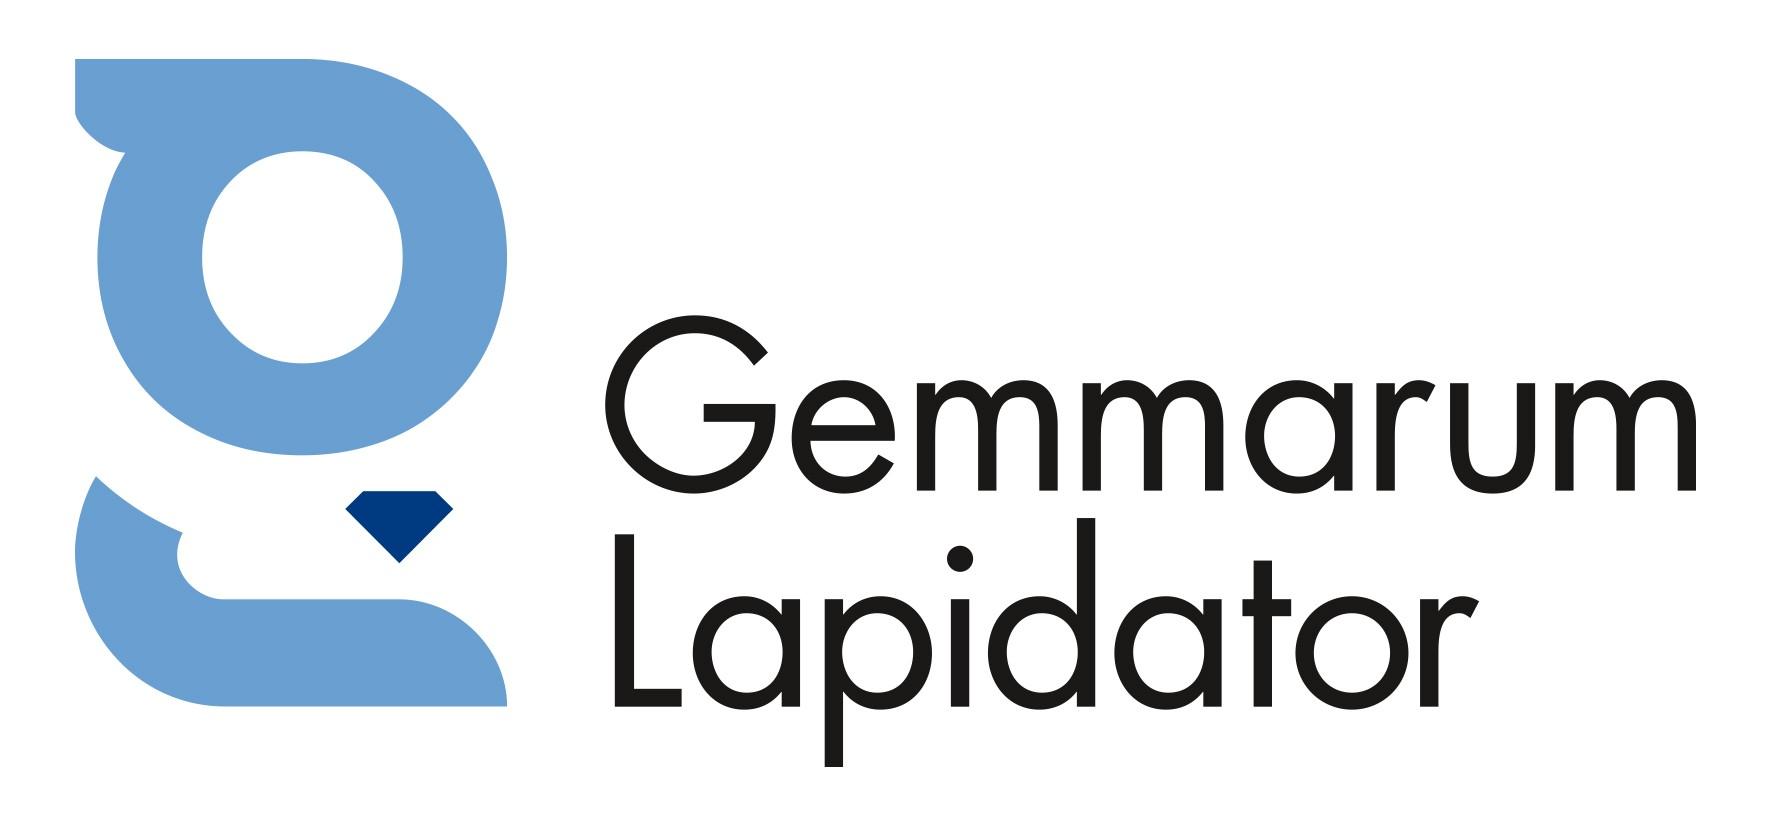 Gemmarum Lapidator srl